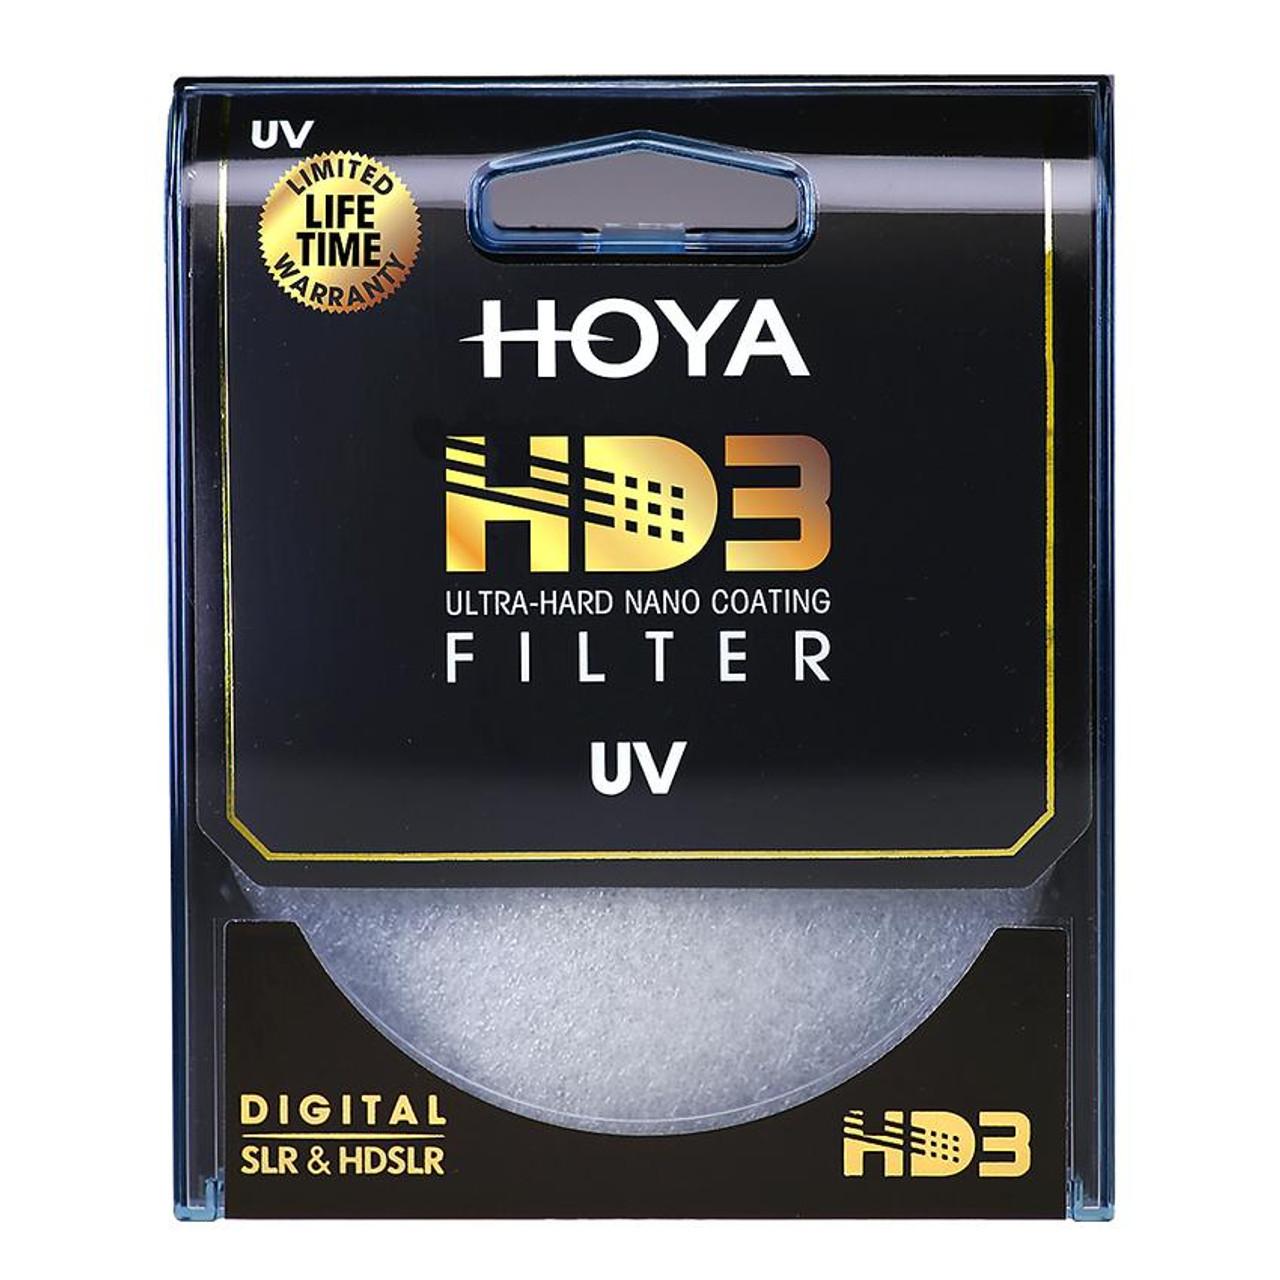 HOYA HD3 UV/PROTECTOR FILTERS